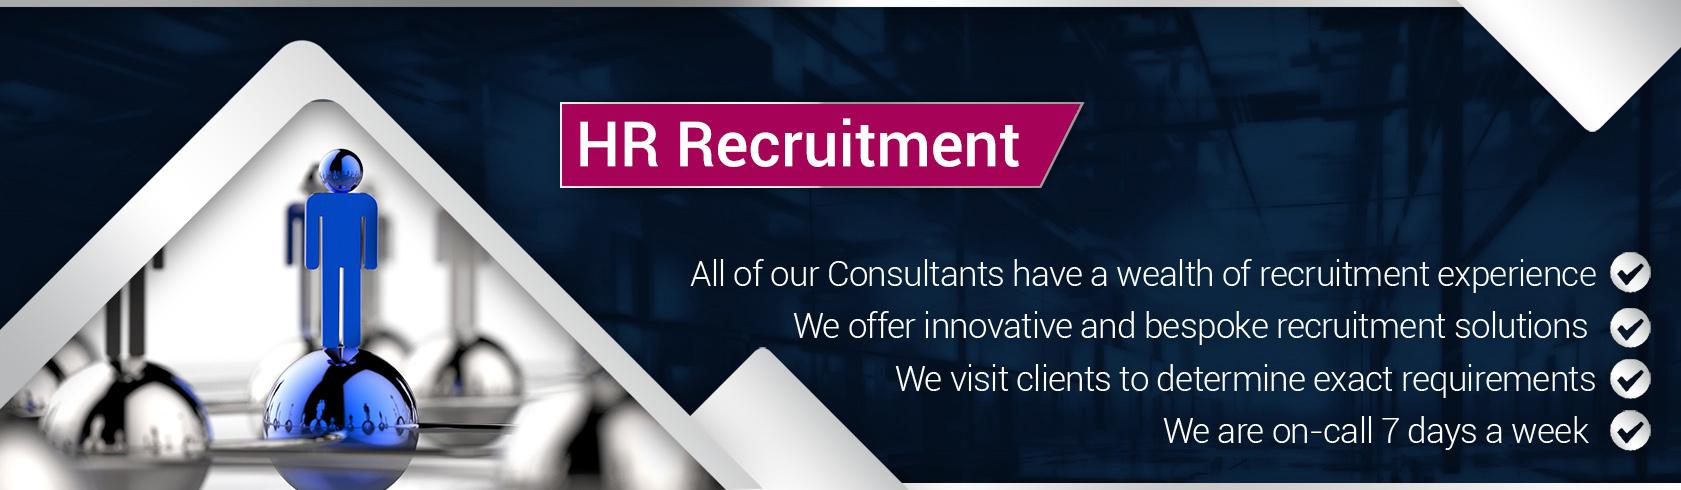 hr-recruitment-1